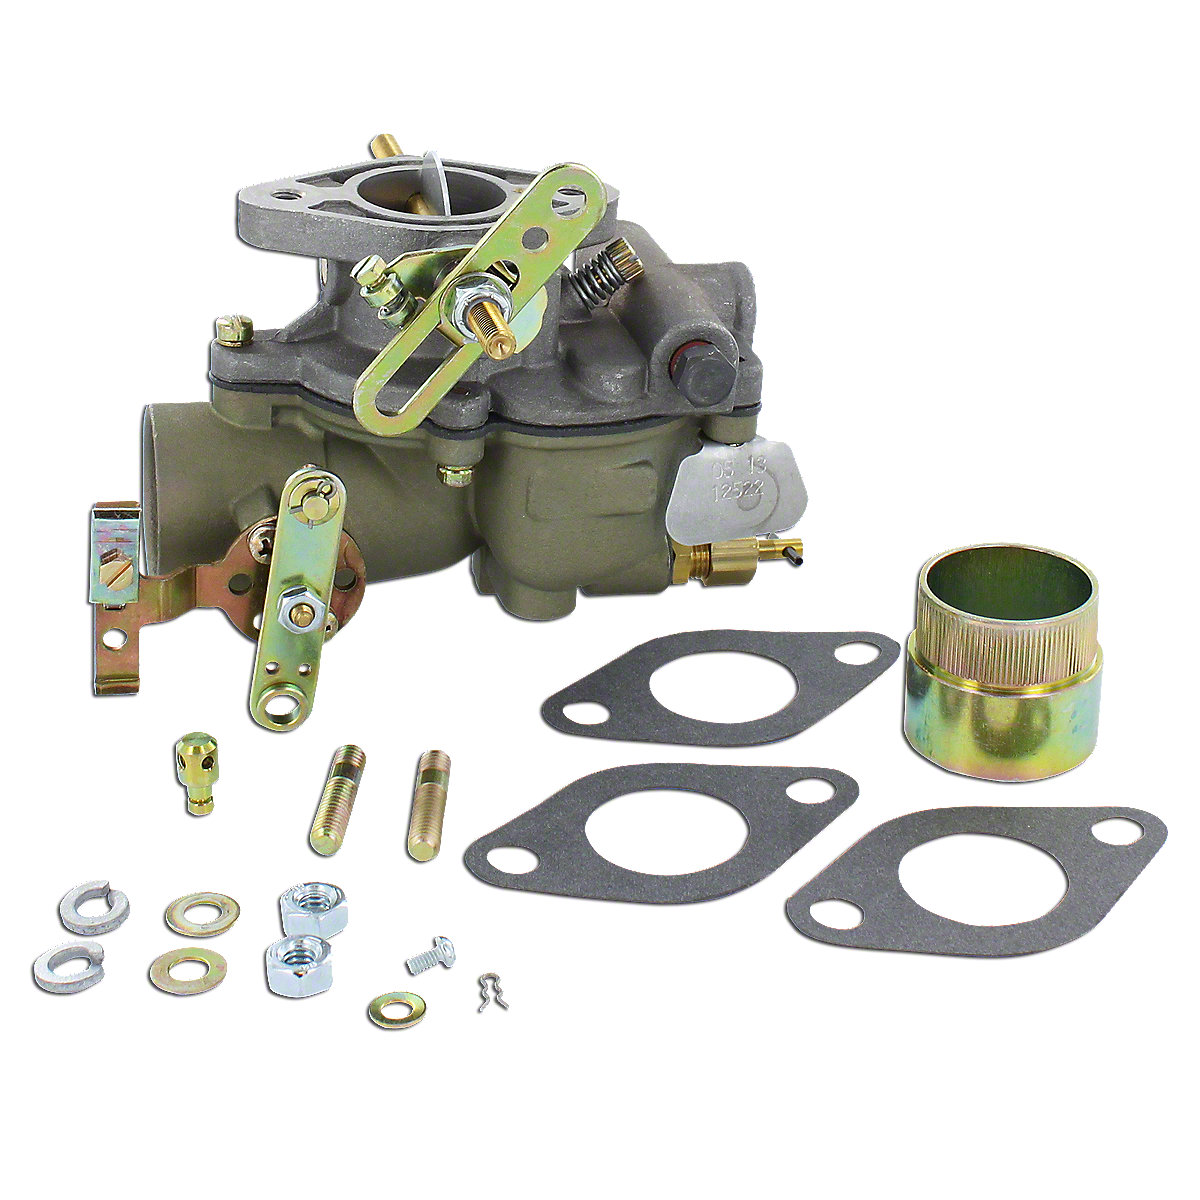 ABC223Carburetor, New Zenith Universal Replacement